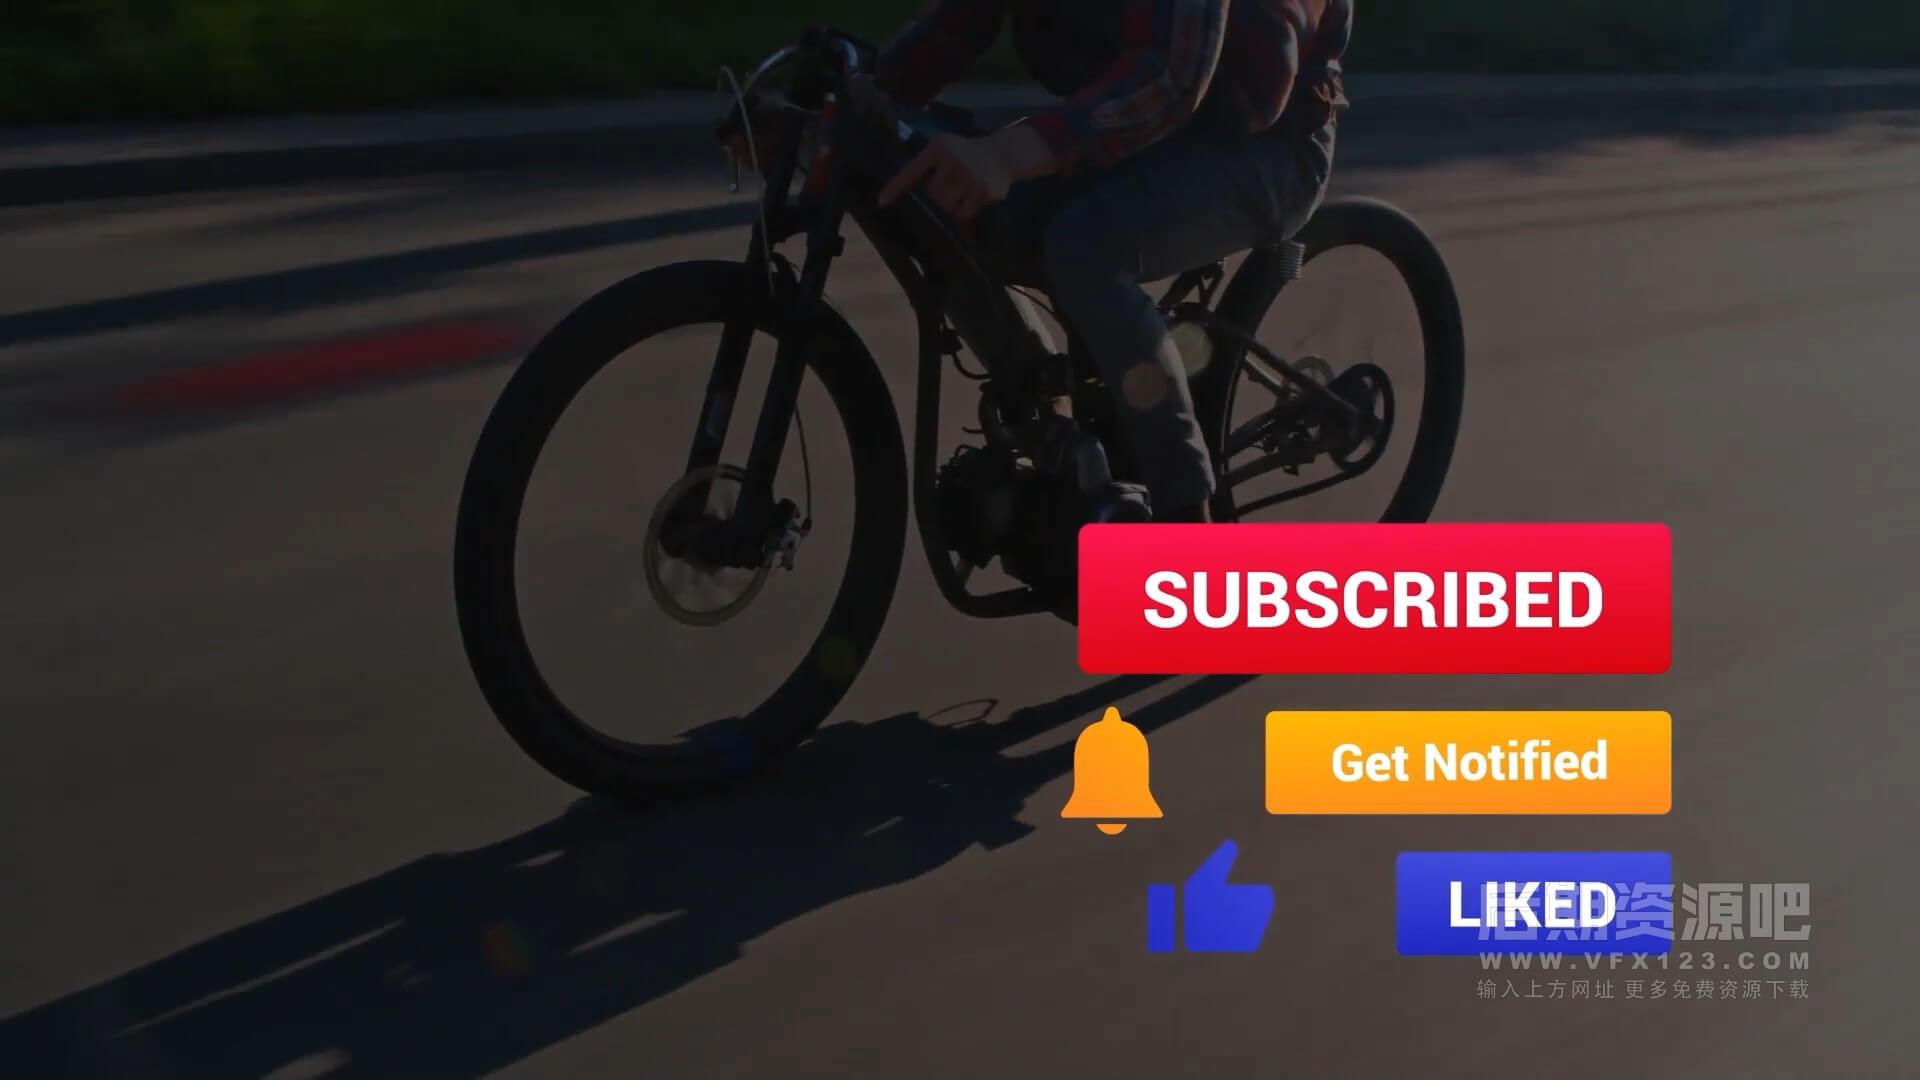 fcpx插件 10组彩色博主头像订阅通知点赞模板 Colorful Subscribes